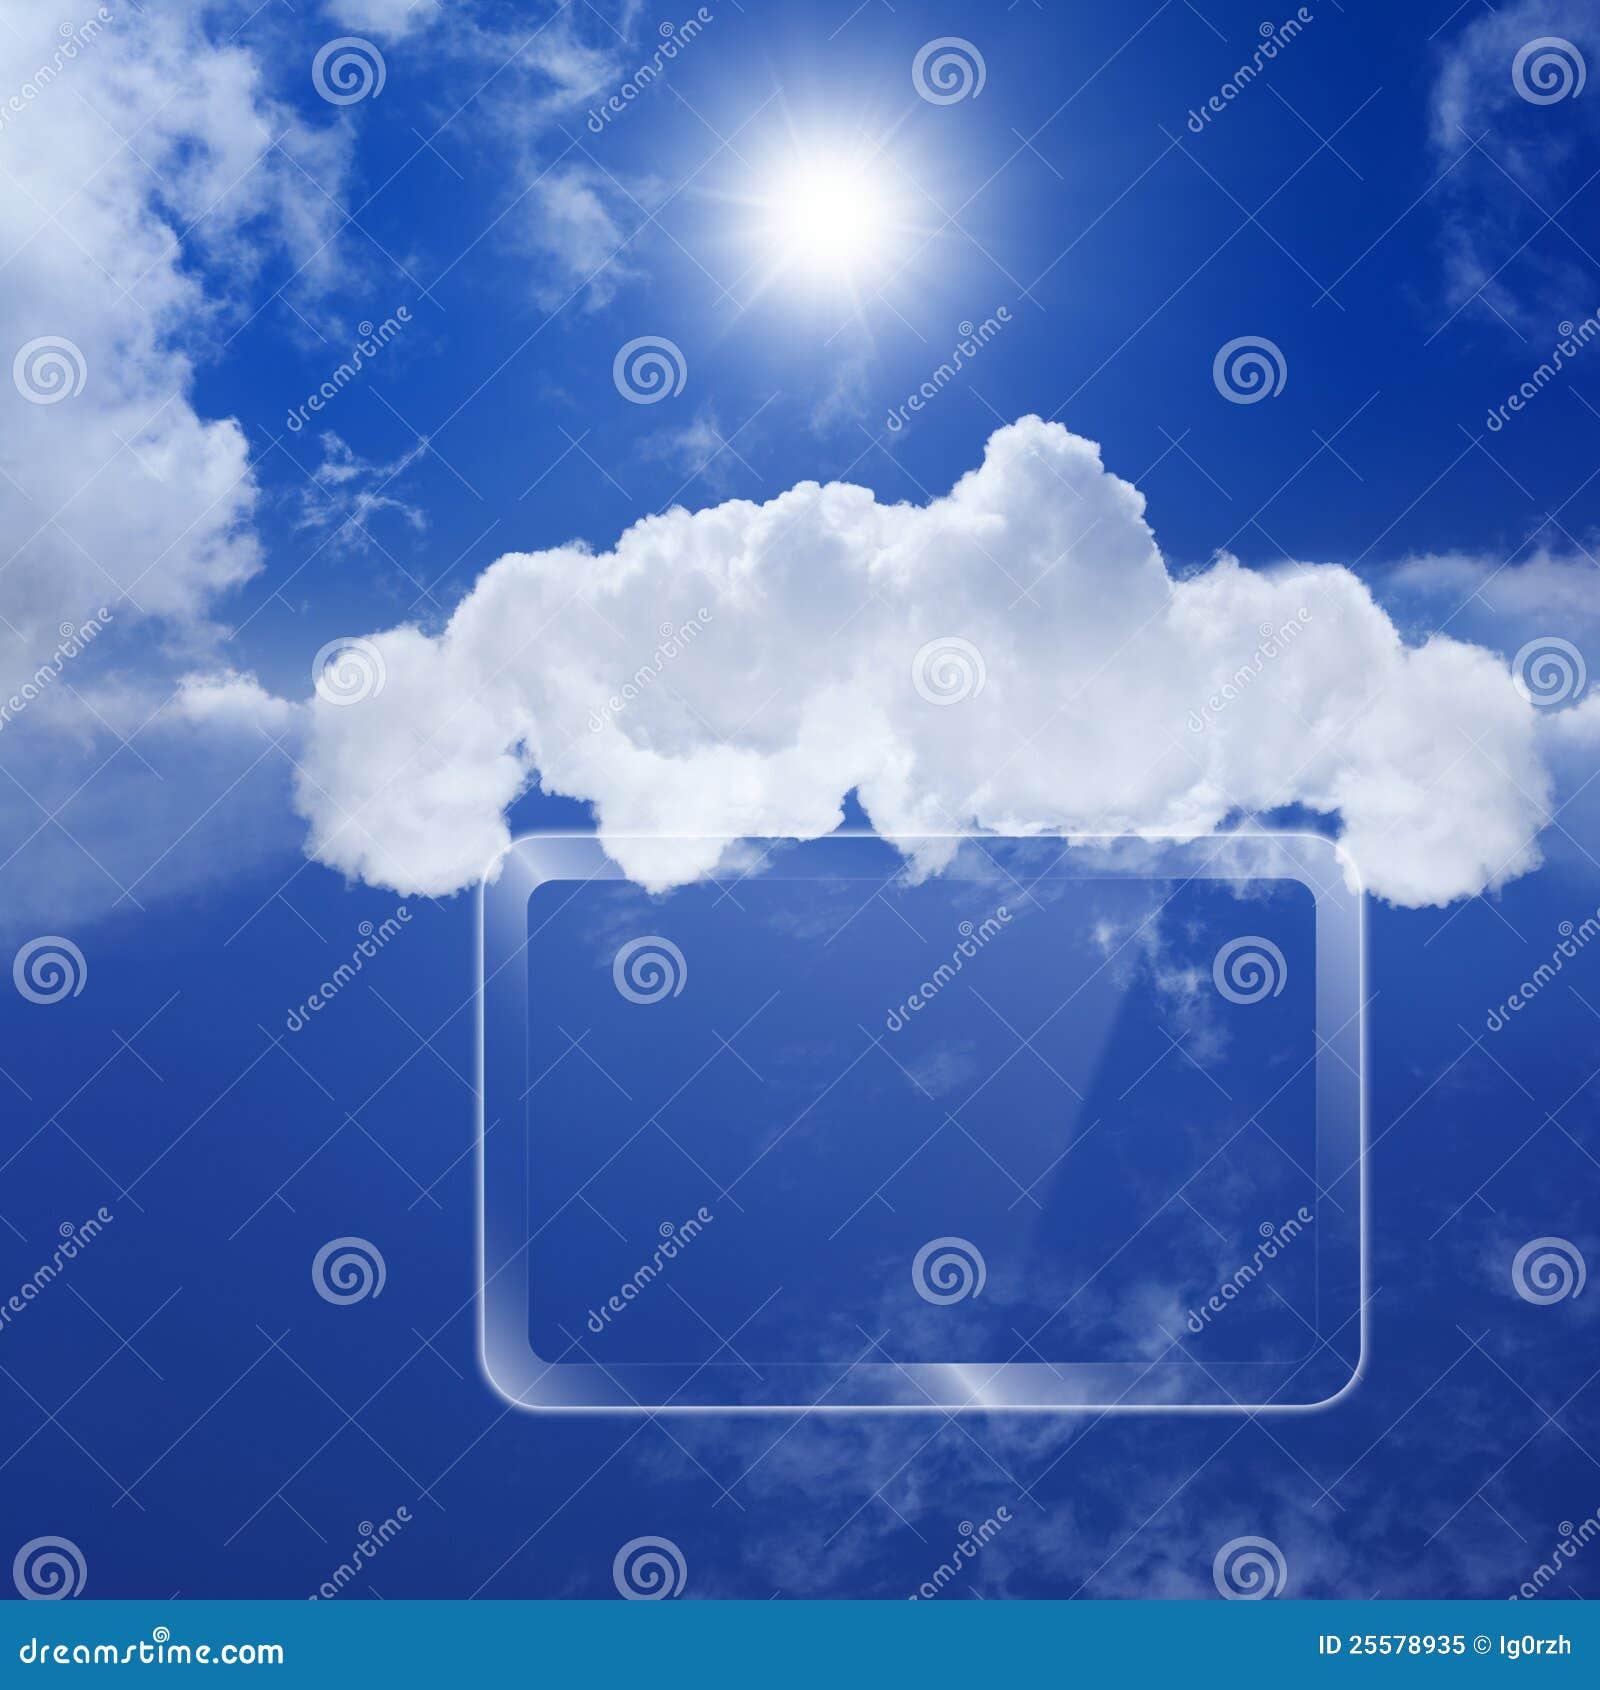 Cloud Computing Royalty Free Stock Photo - Image: 25578935